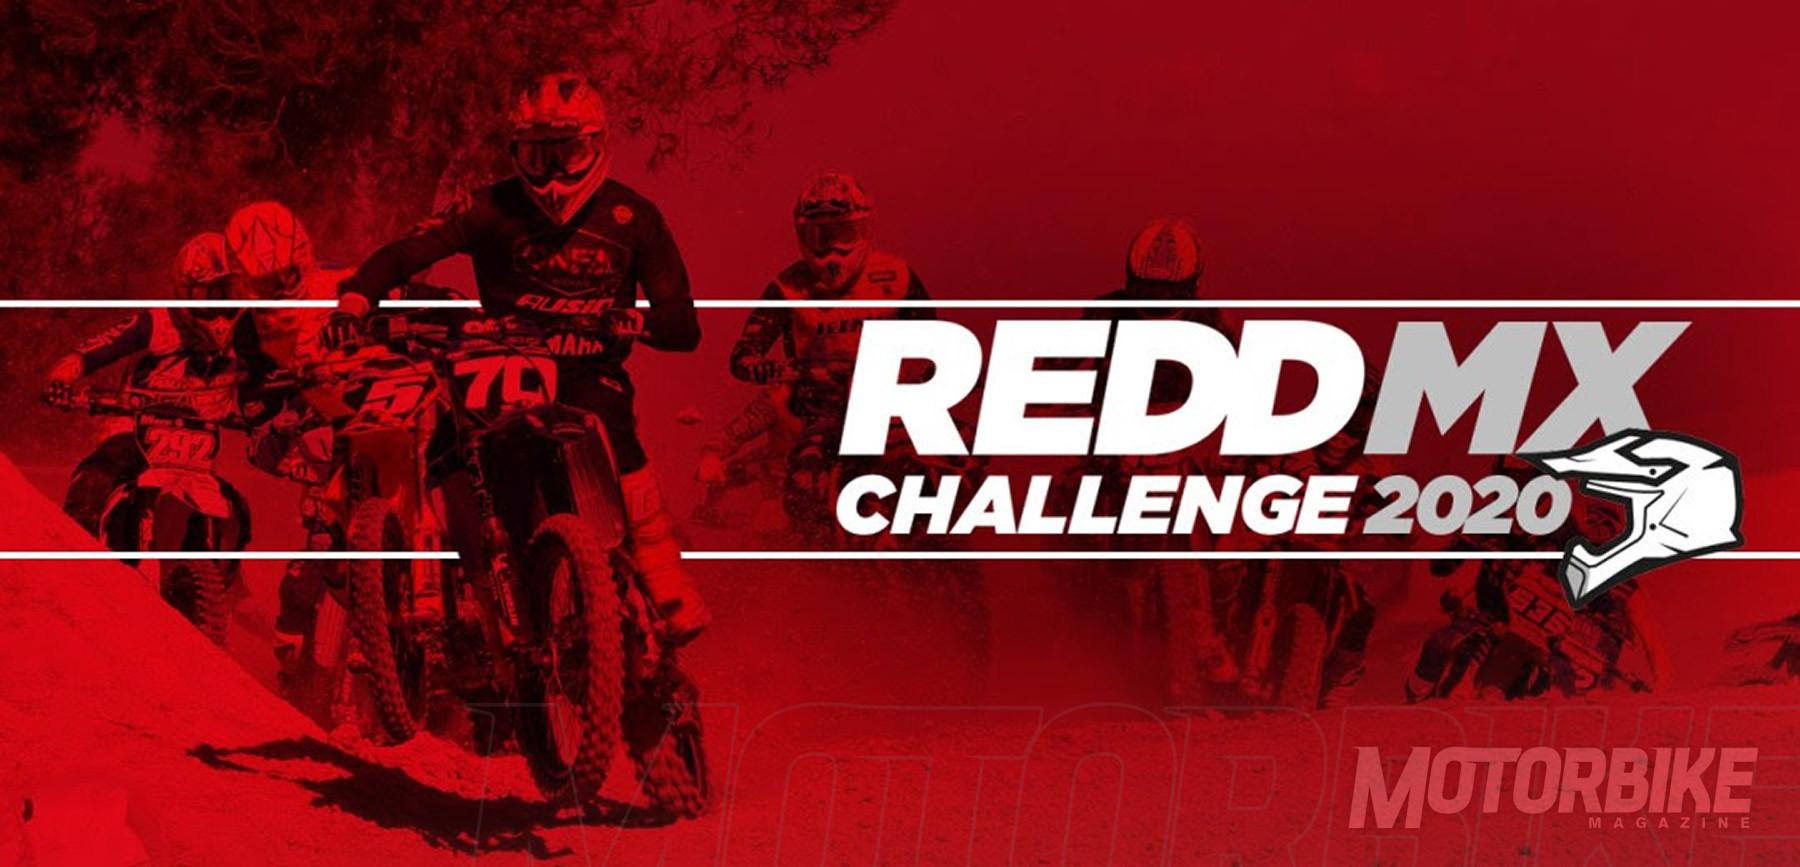 Campeonato de motocross 2020